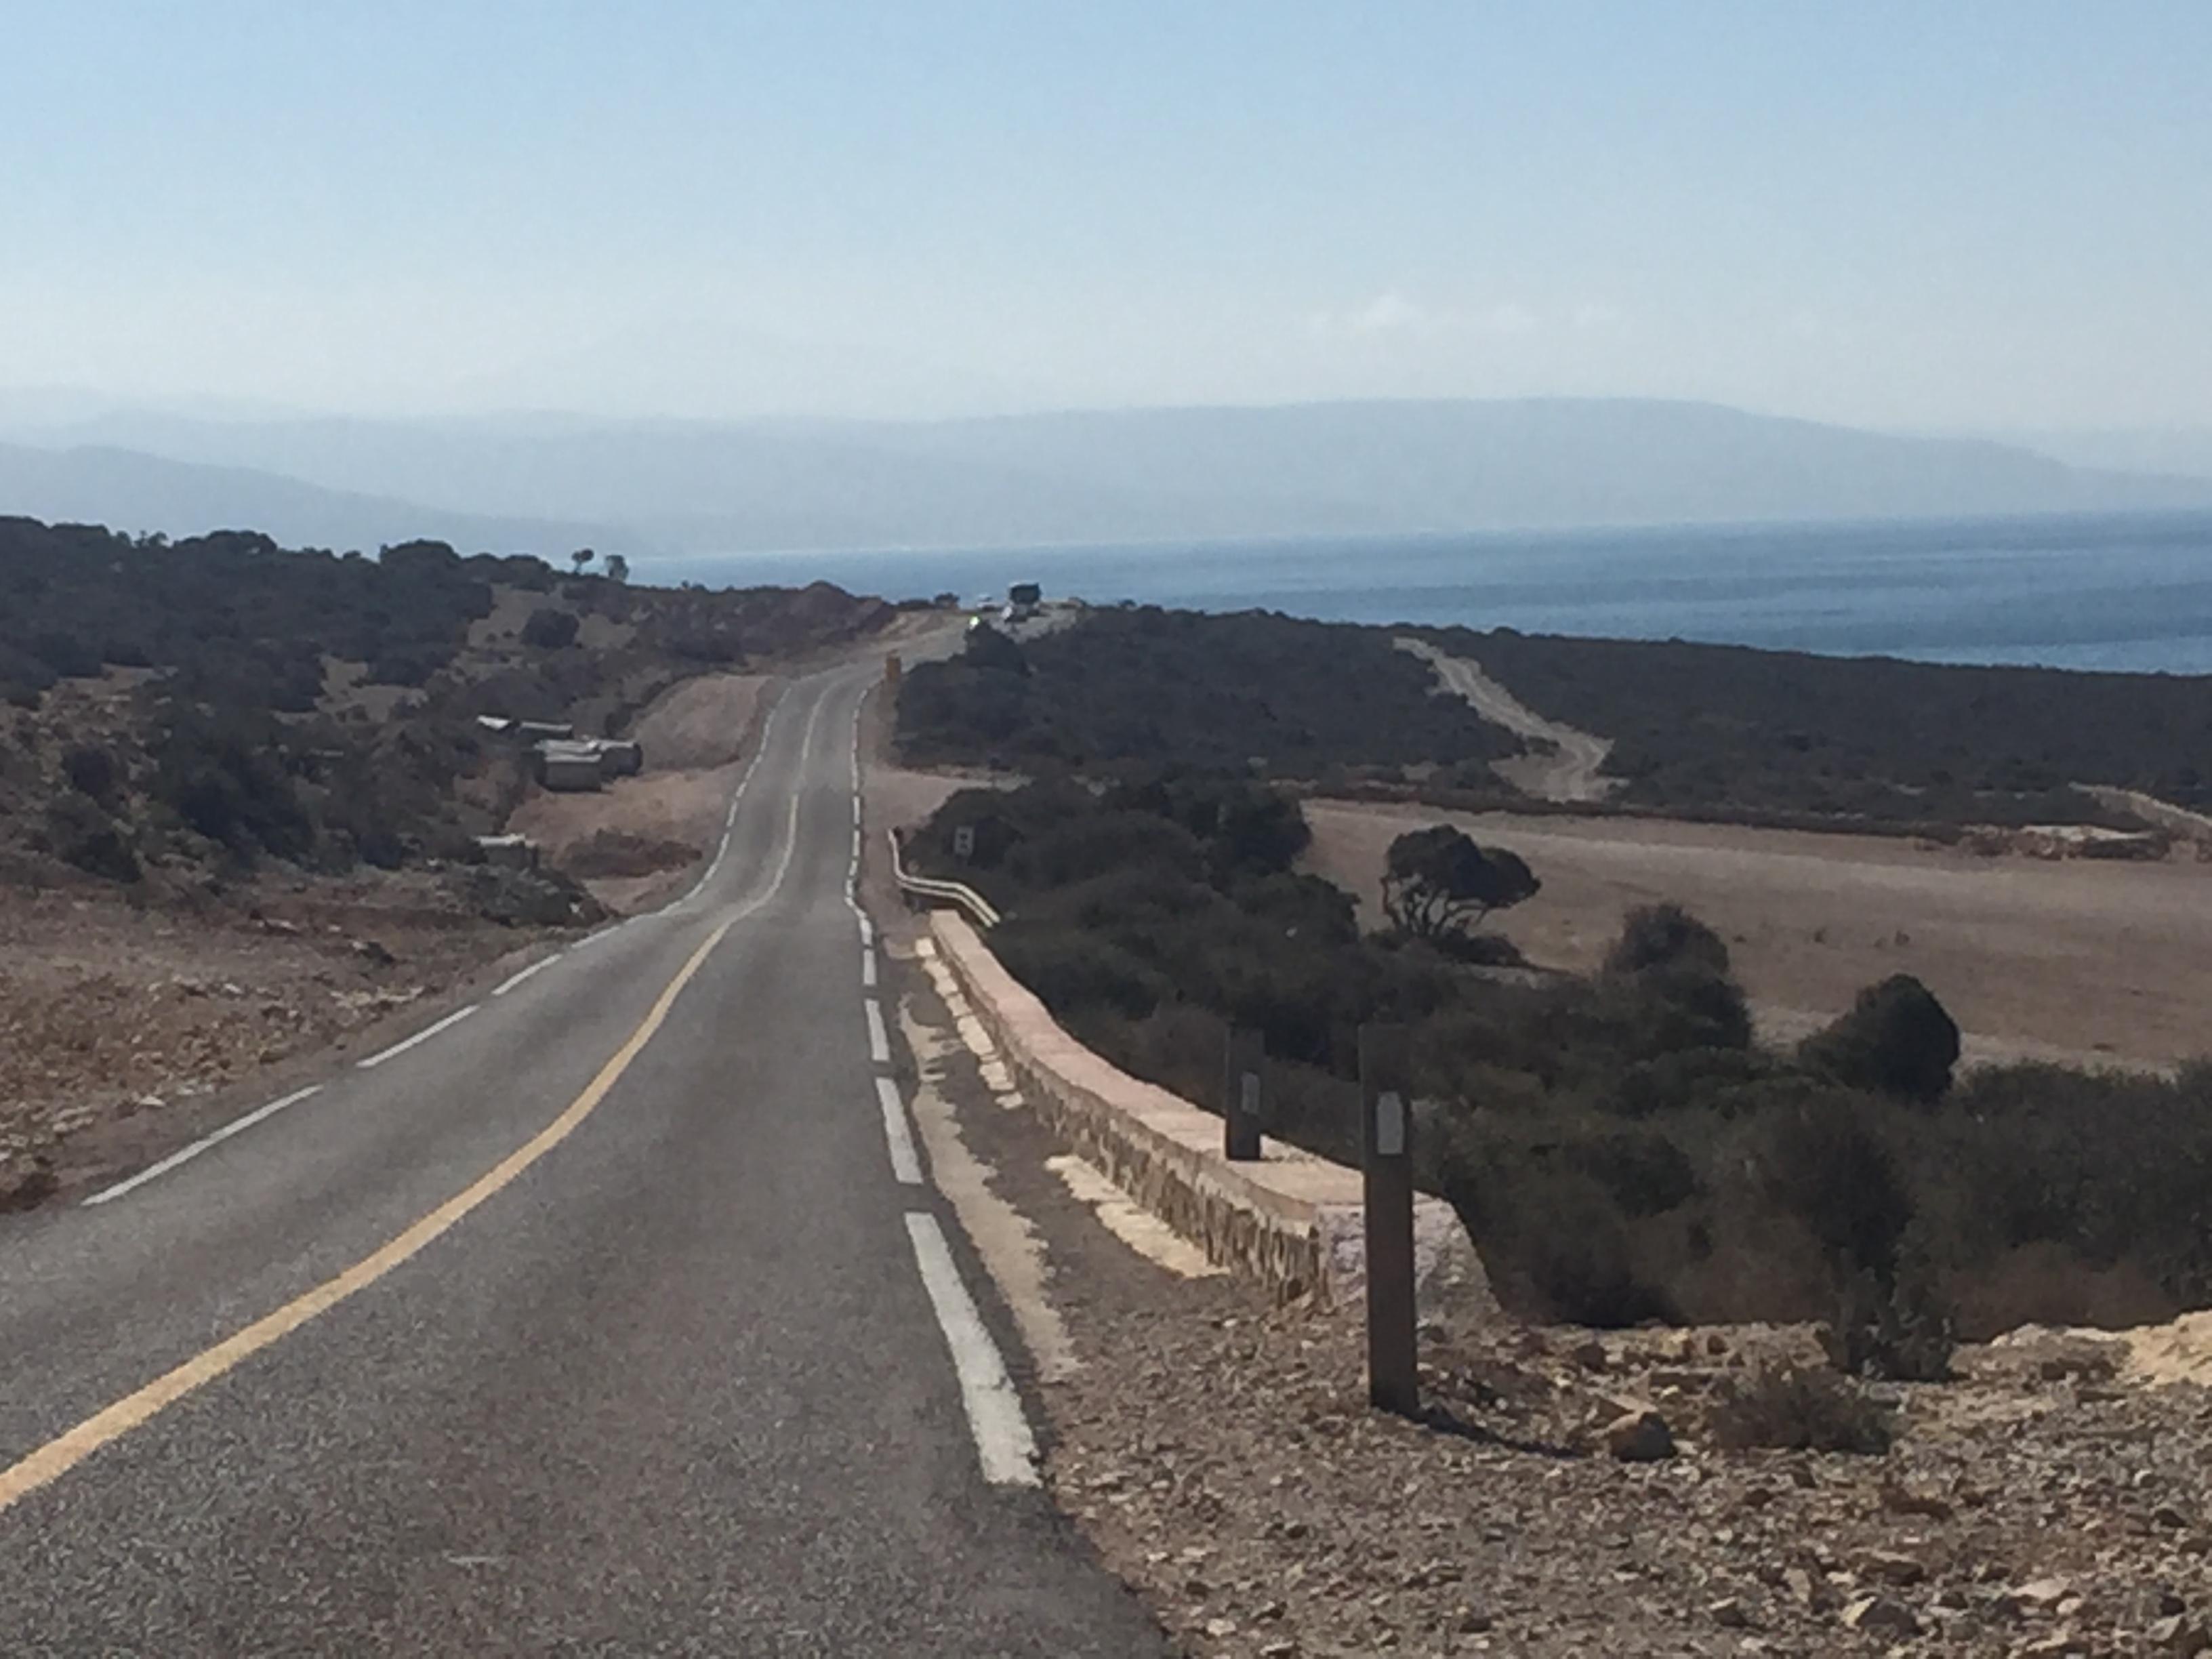 die bergige, steile Straße nach Agadir